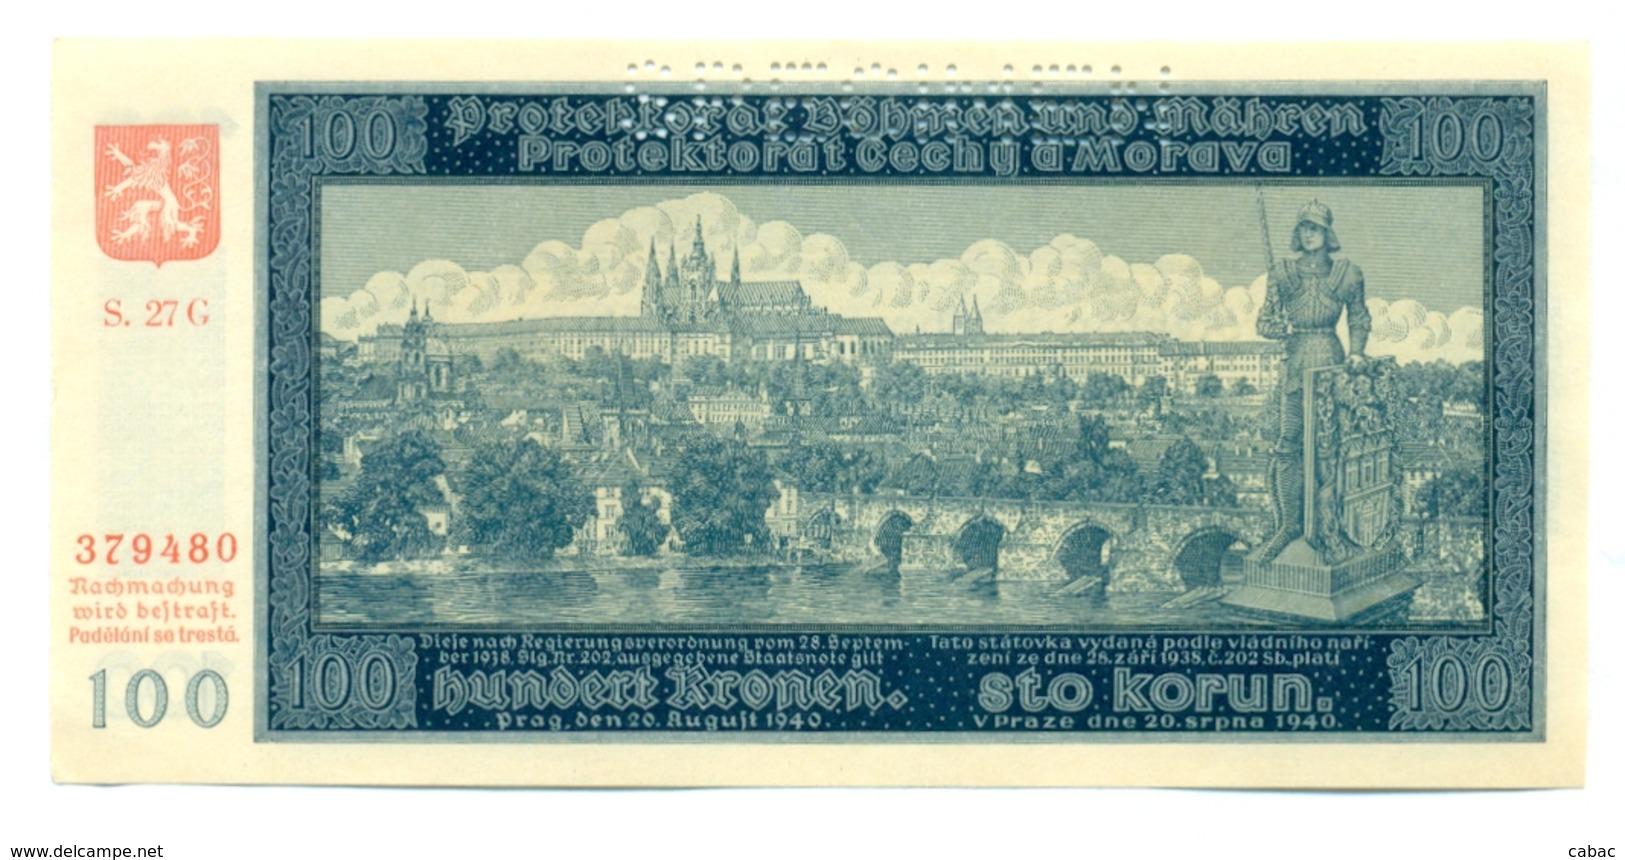 Hundert Kronen, Sto Korun, 100 Korun, PROTEKTORAT, 1940, SPECIMEN, Čechya Morava, S. 27G Bohemia Moravia - Tchécoslovaquie